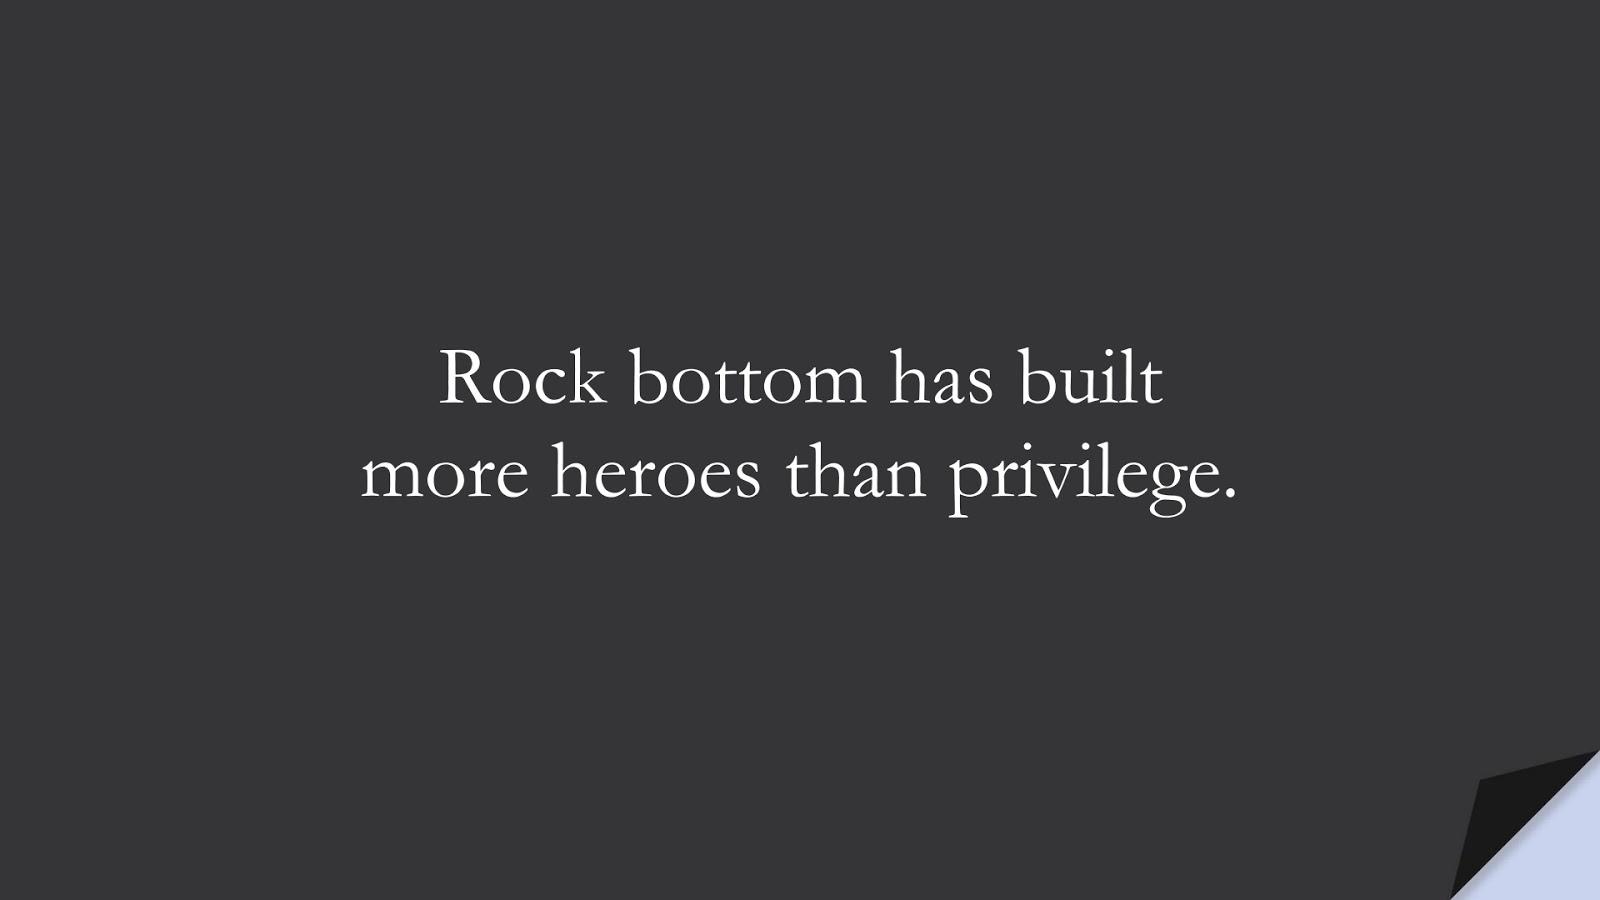 Rock bottom has built more heroes than privilege.FALSE